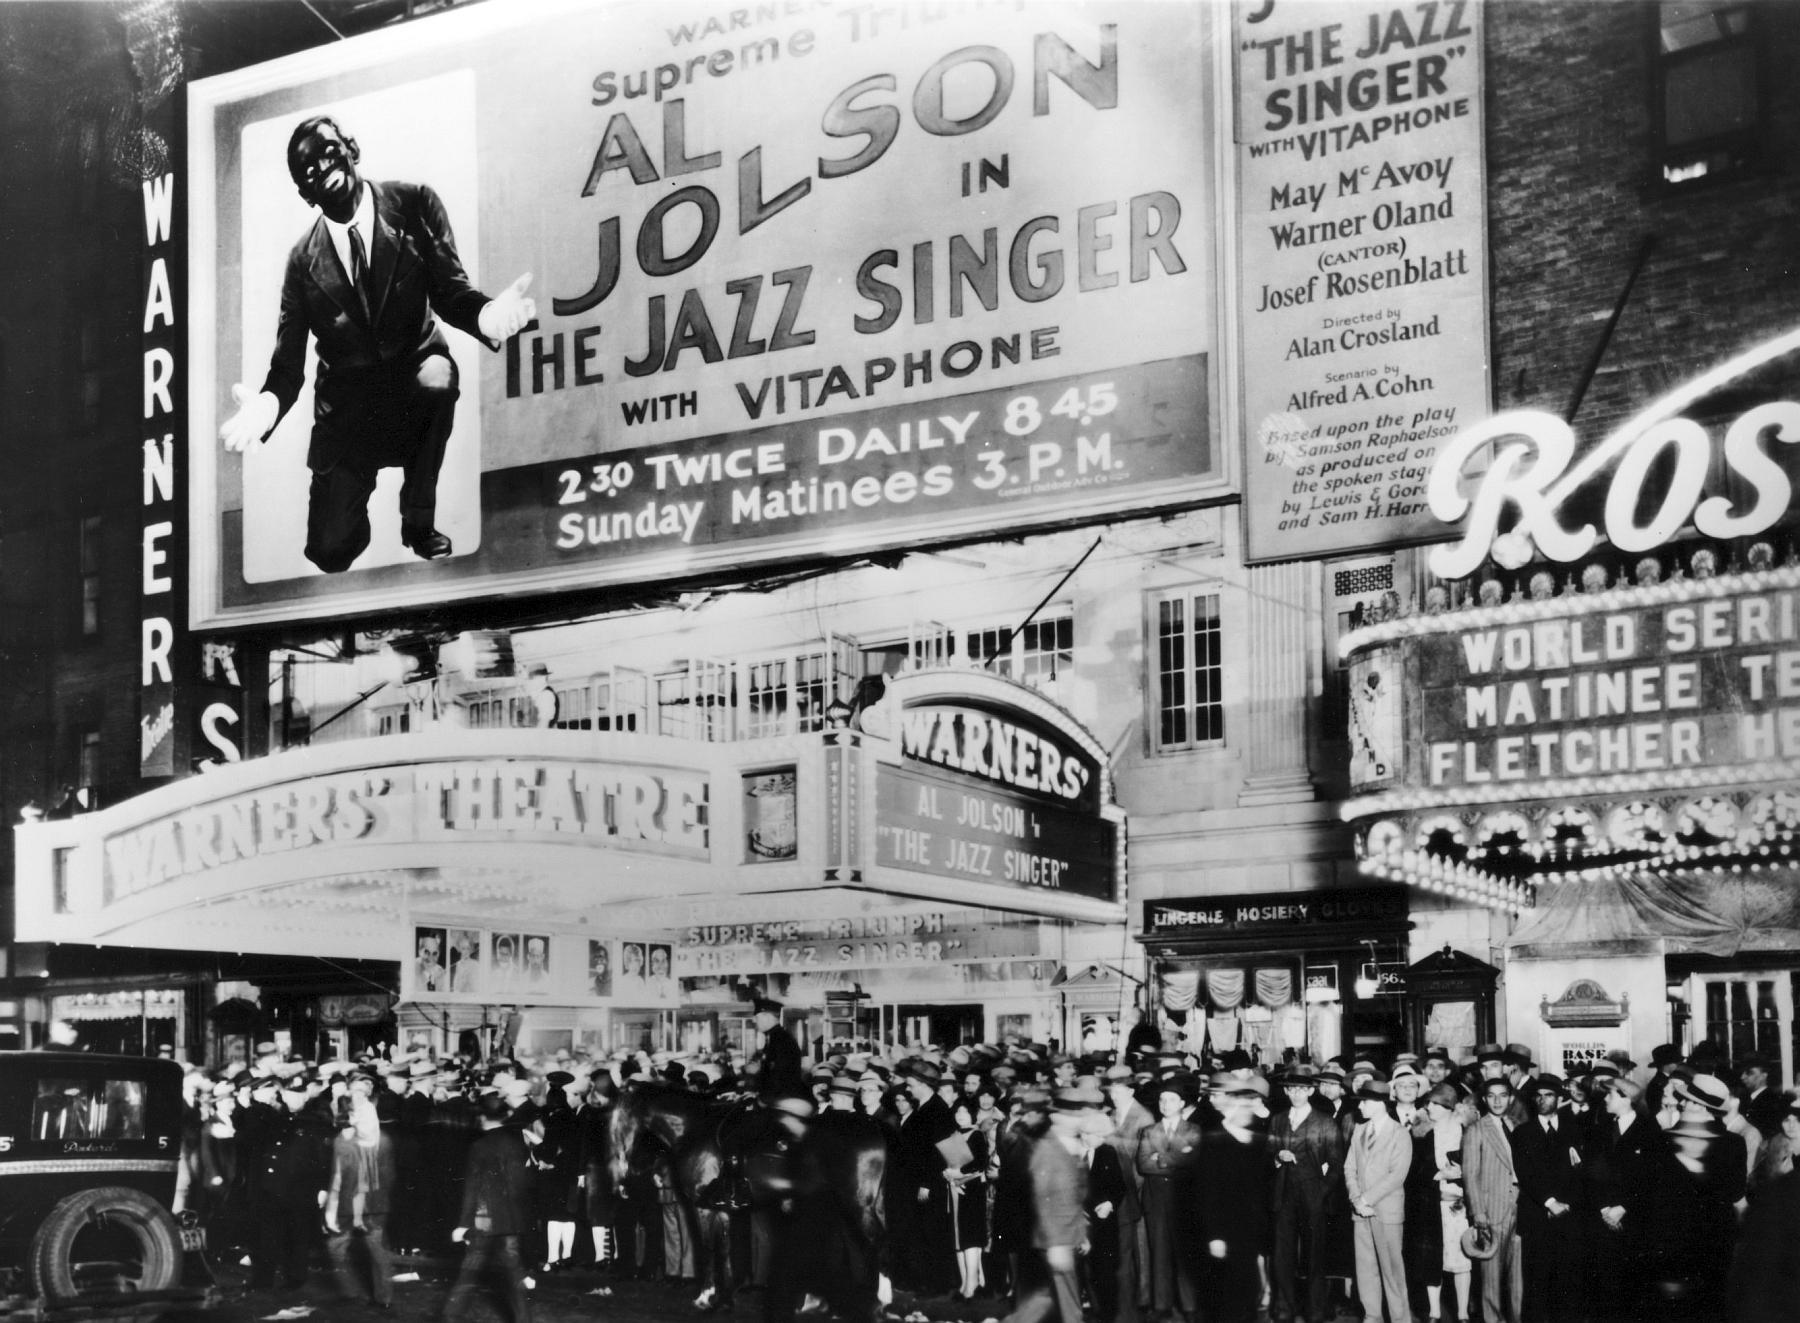 al-jolson-jazz-singer-premiere.jpg